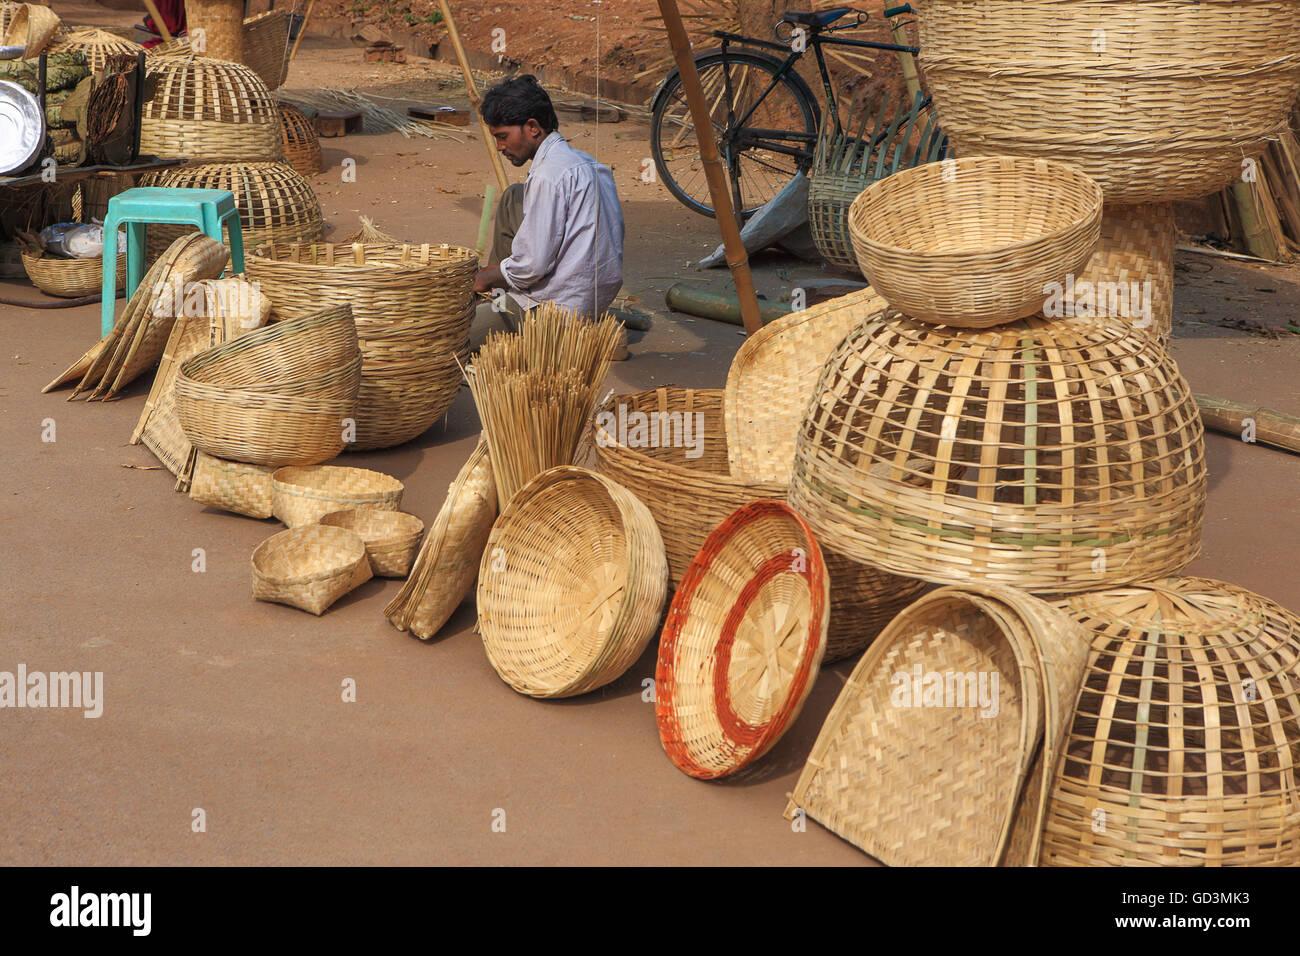 Bamboo Handicrafts Stock Photos Bamboo Handicrafts Stock Images